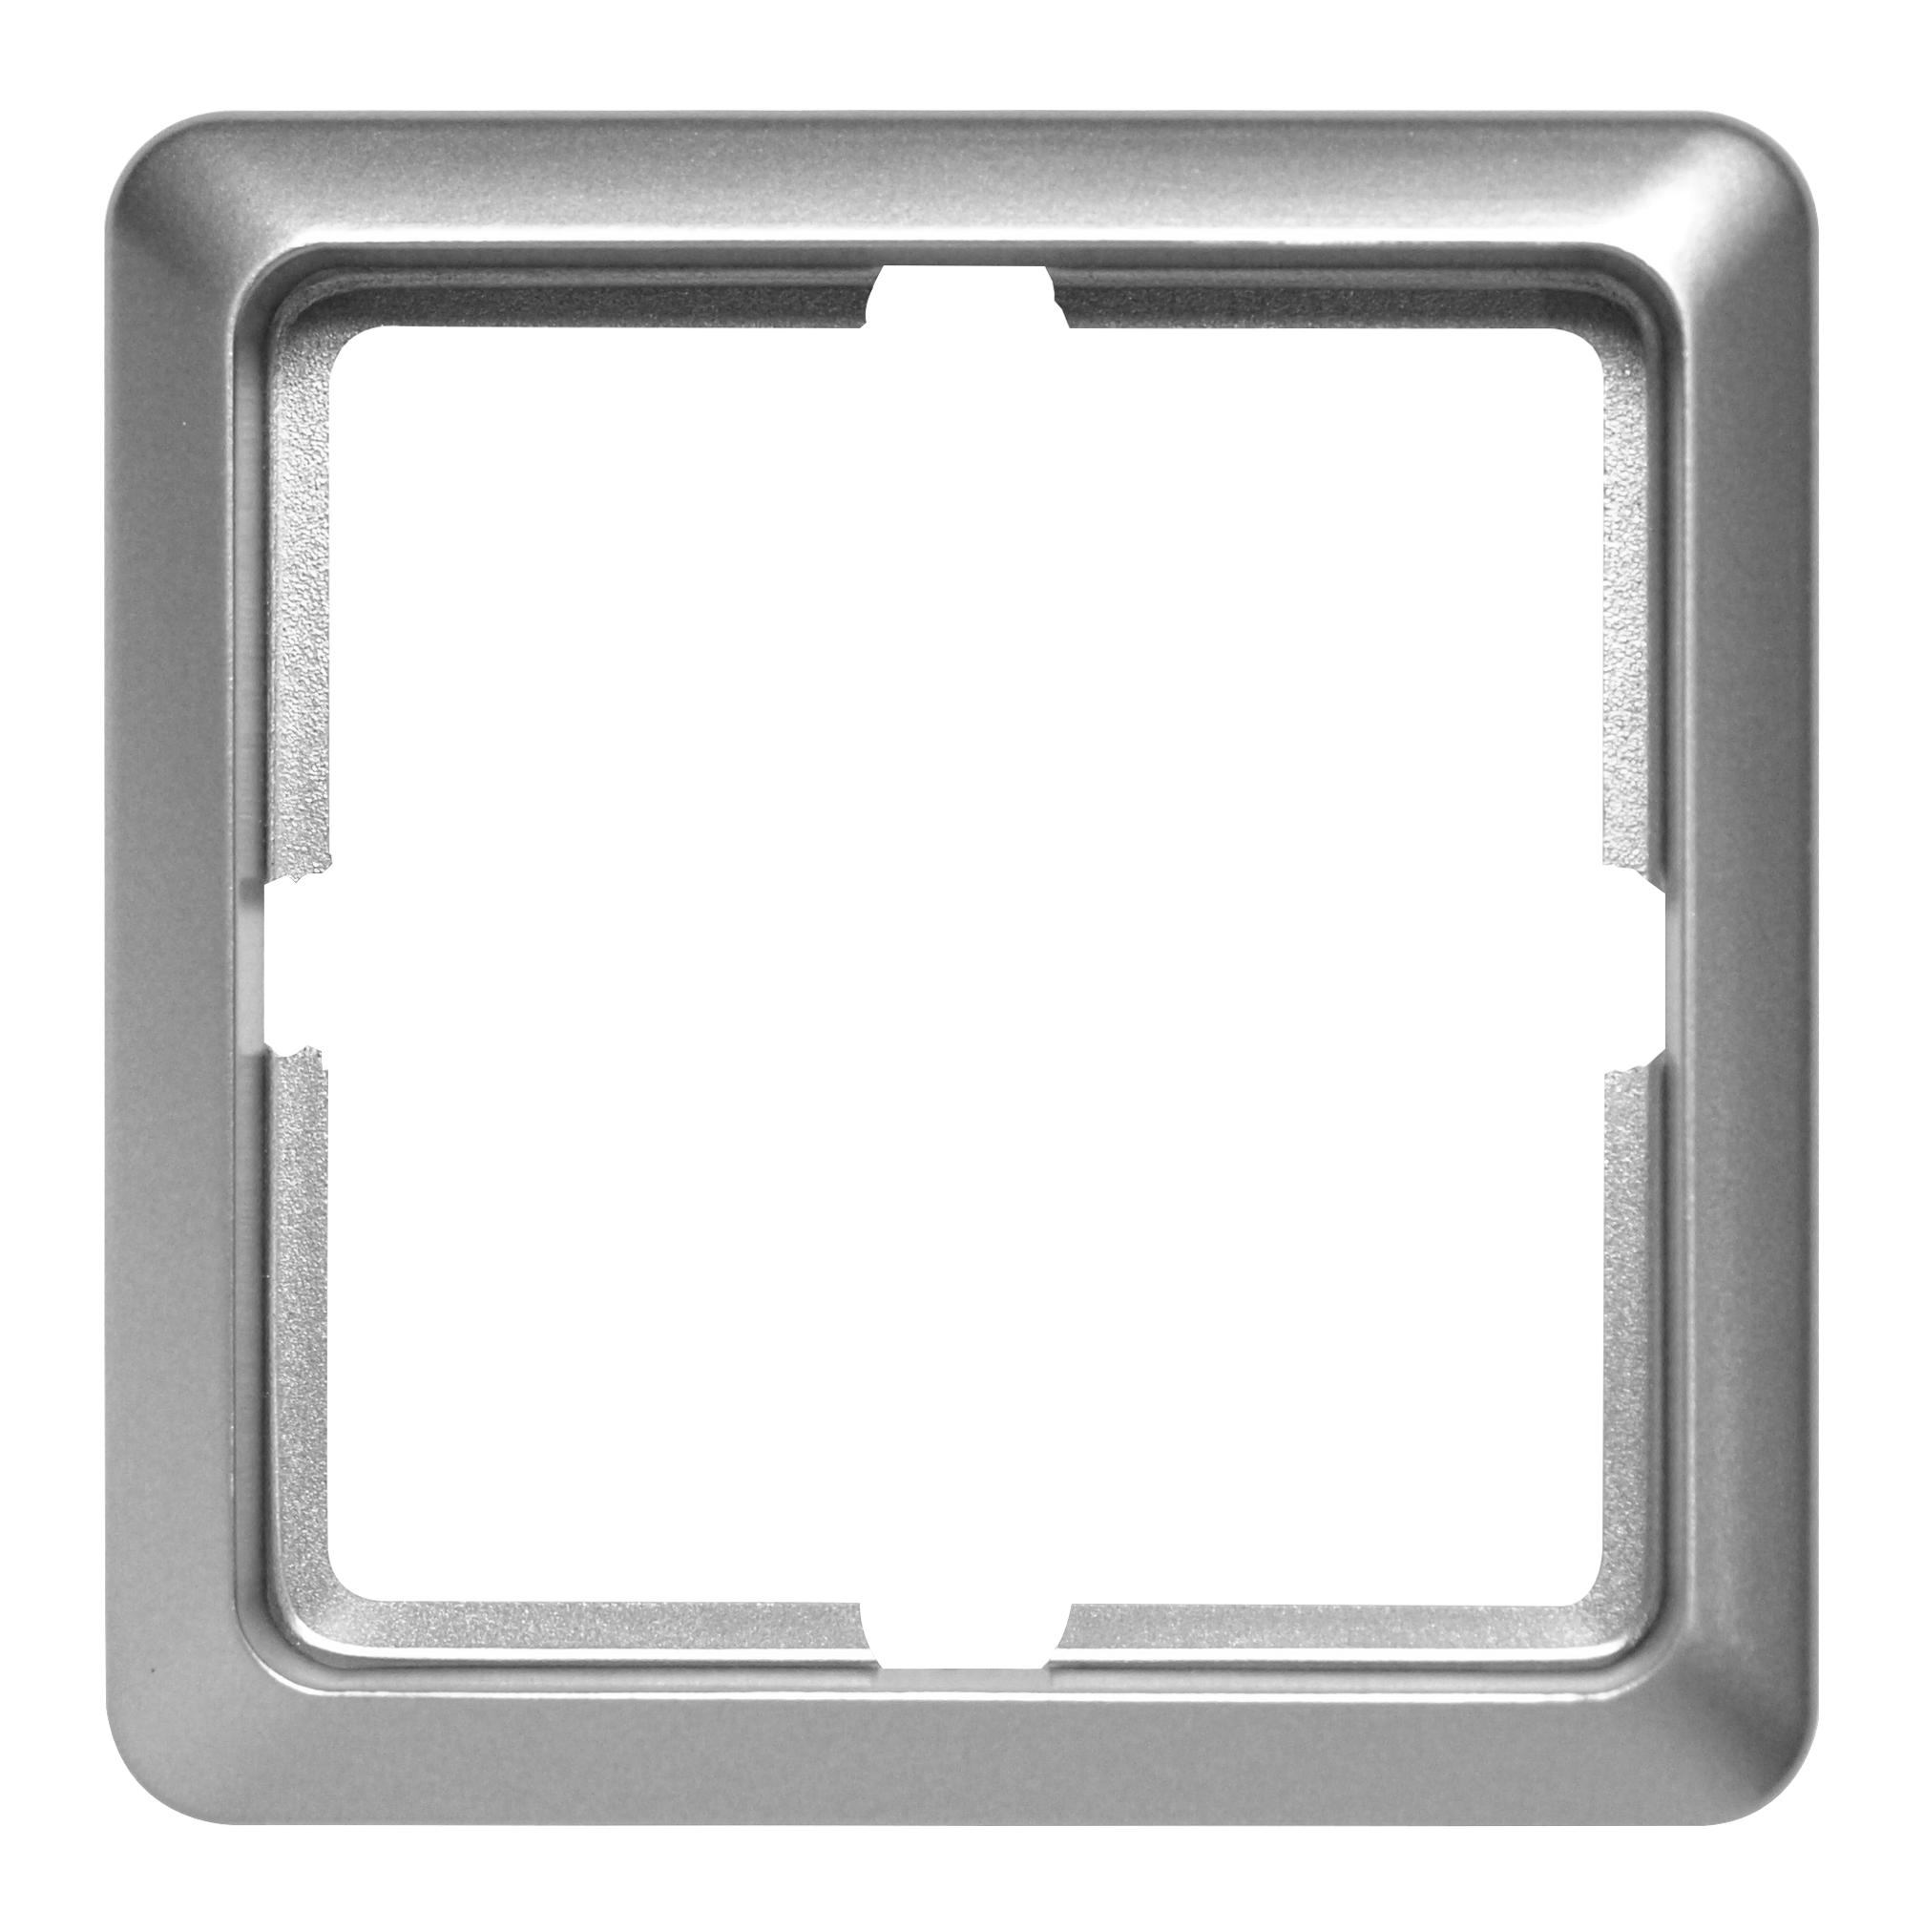 1 Stk Rahmen 1-fach, Alueffekt Scala EL2041119-